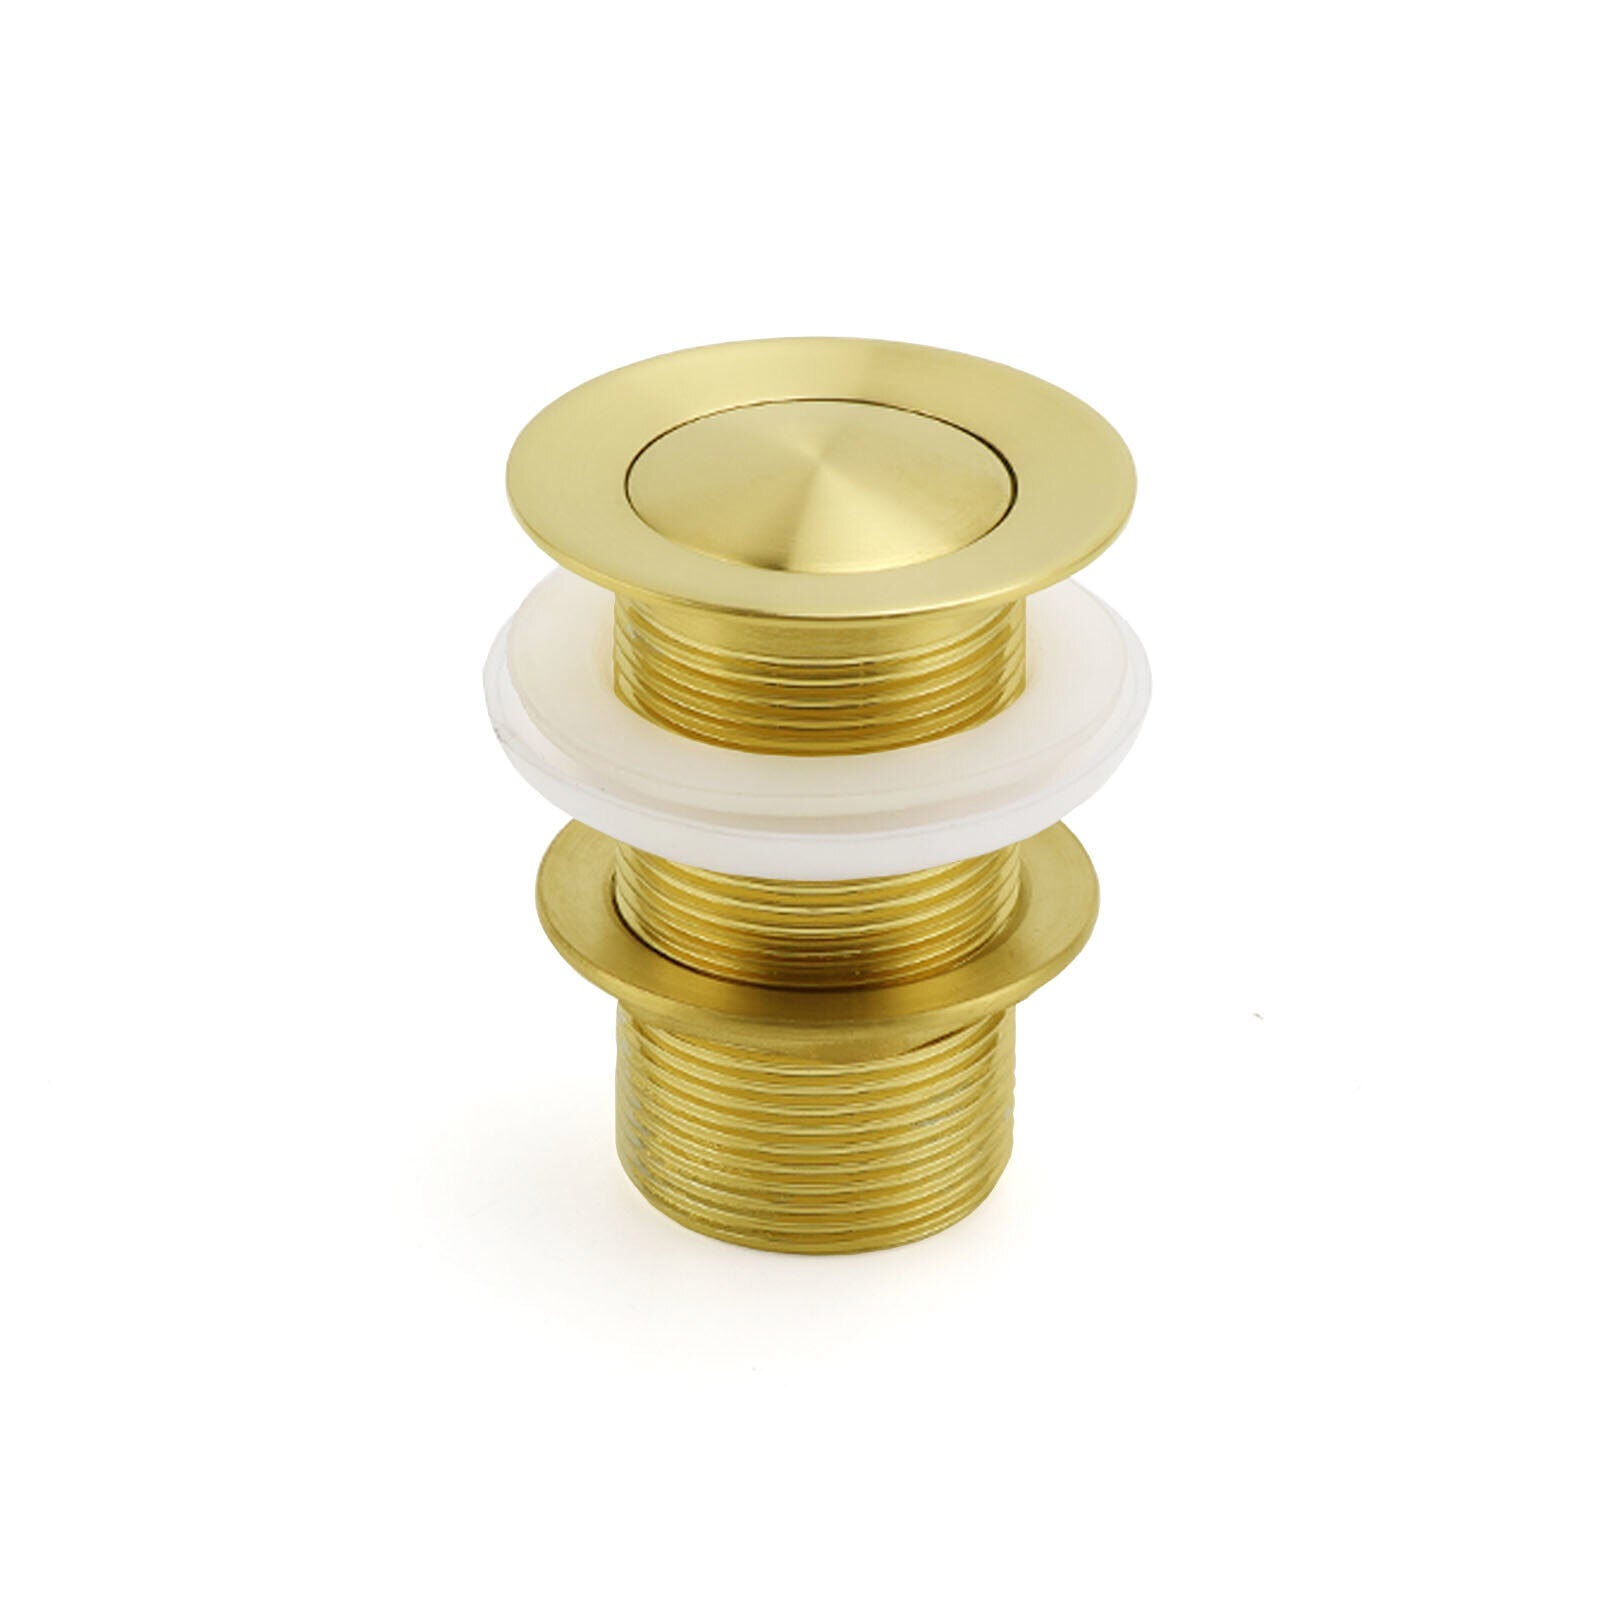 Watermark 32mm Pop Up Push Waste Plug No Overflow Basin Sink Drain Brushed Gold